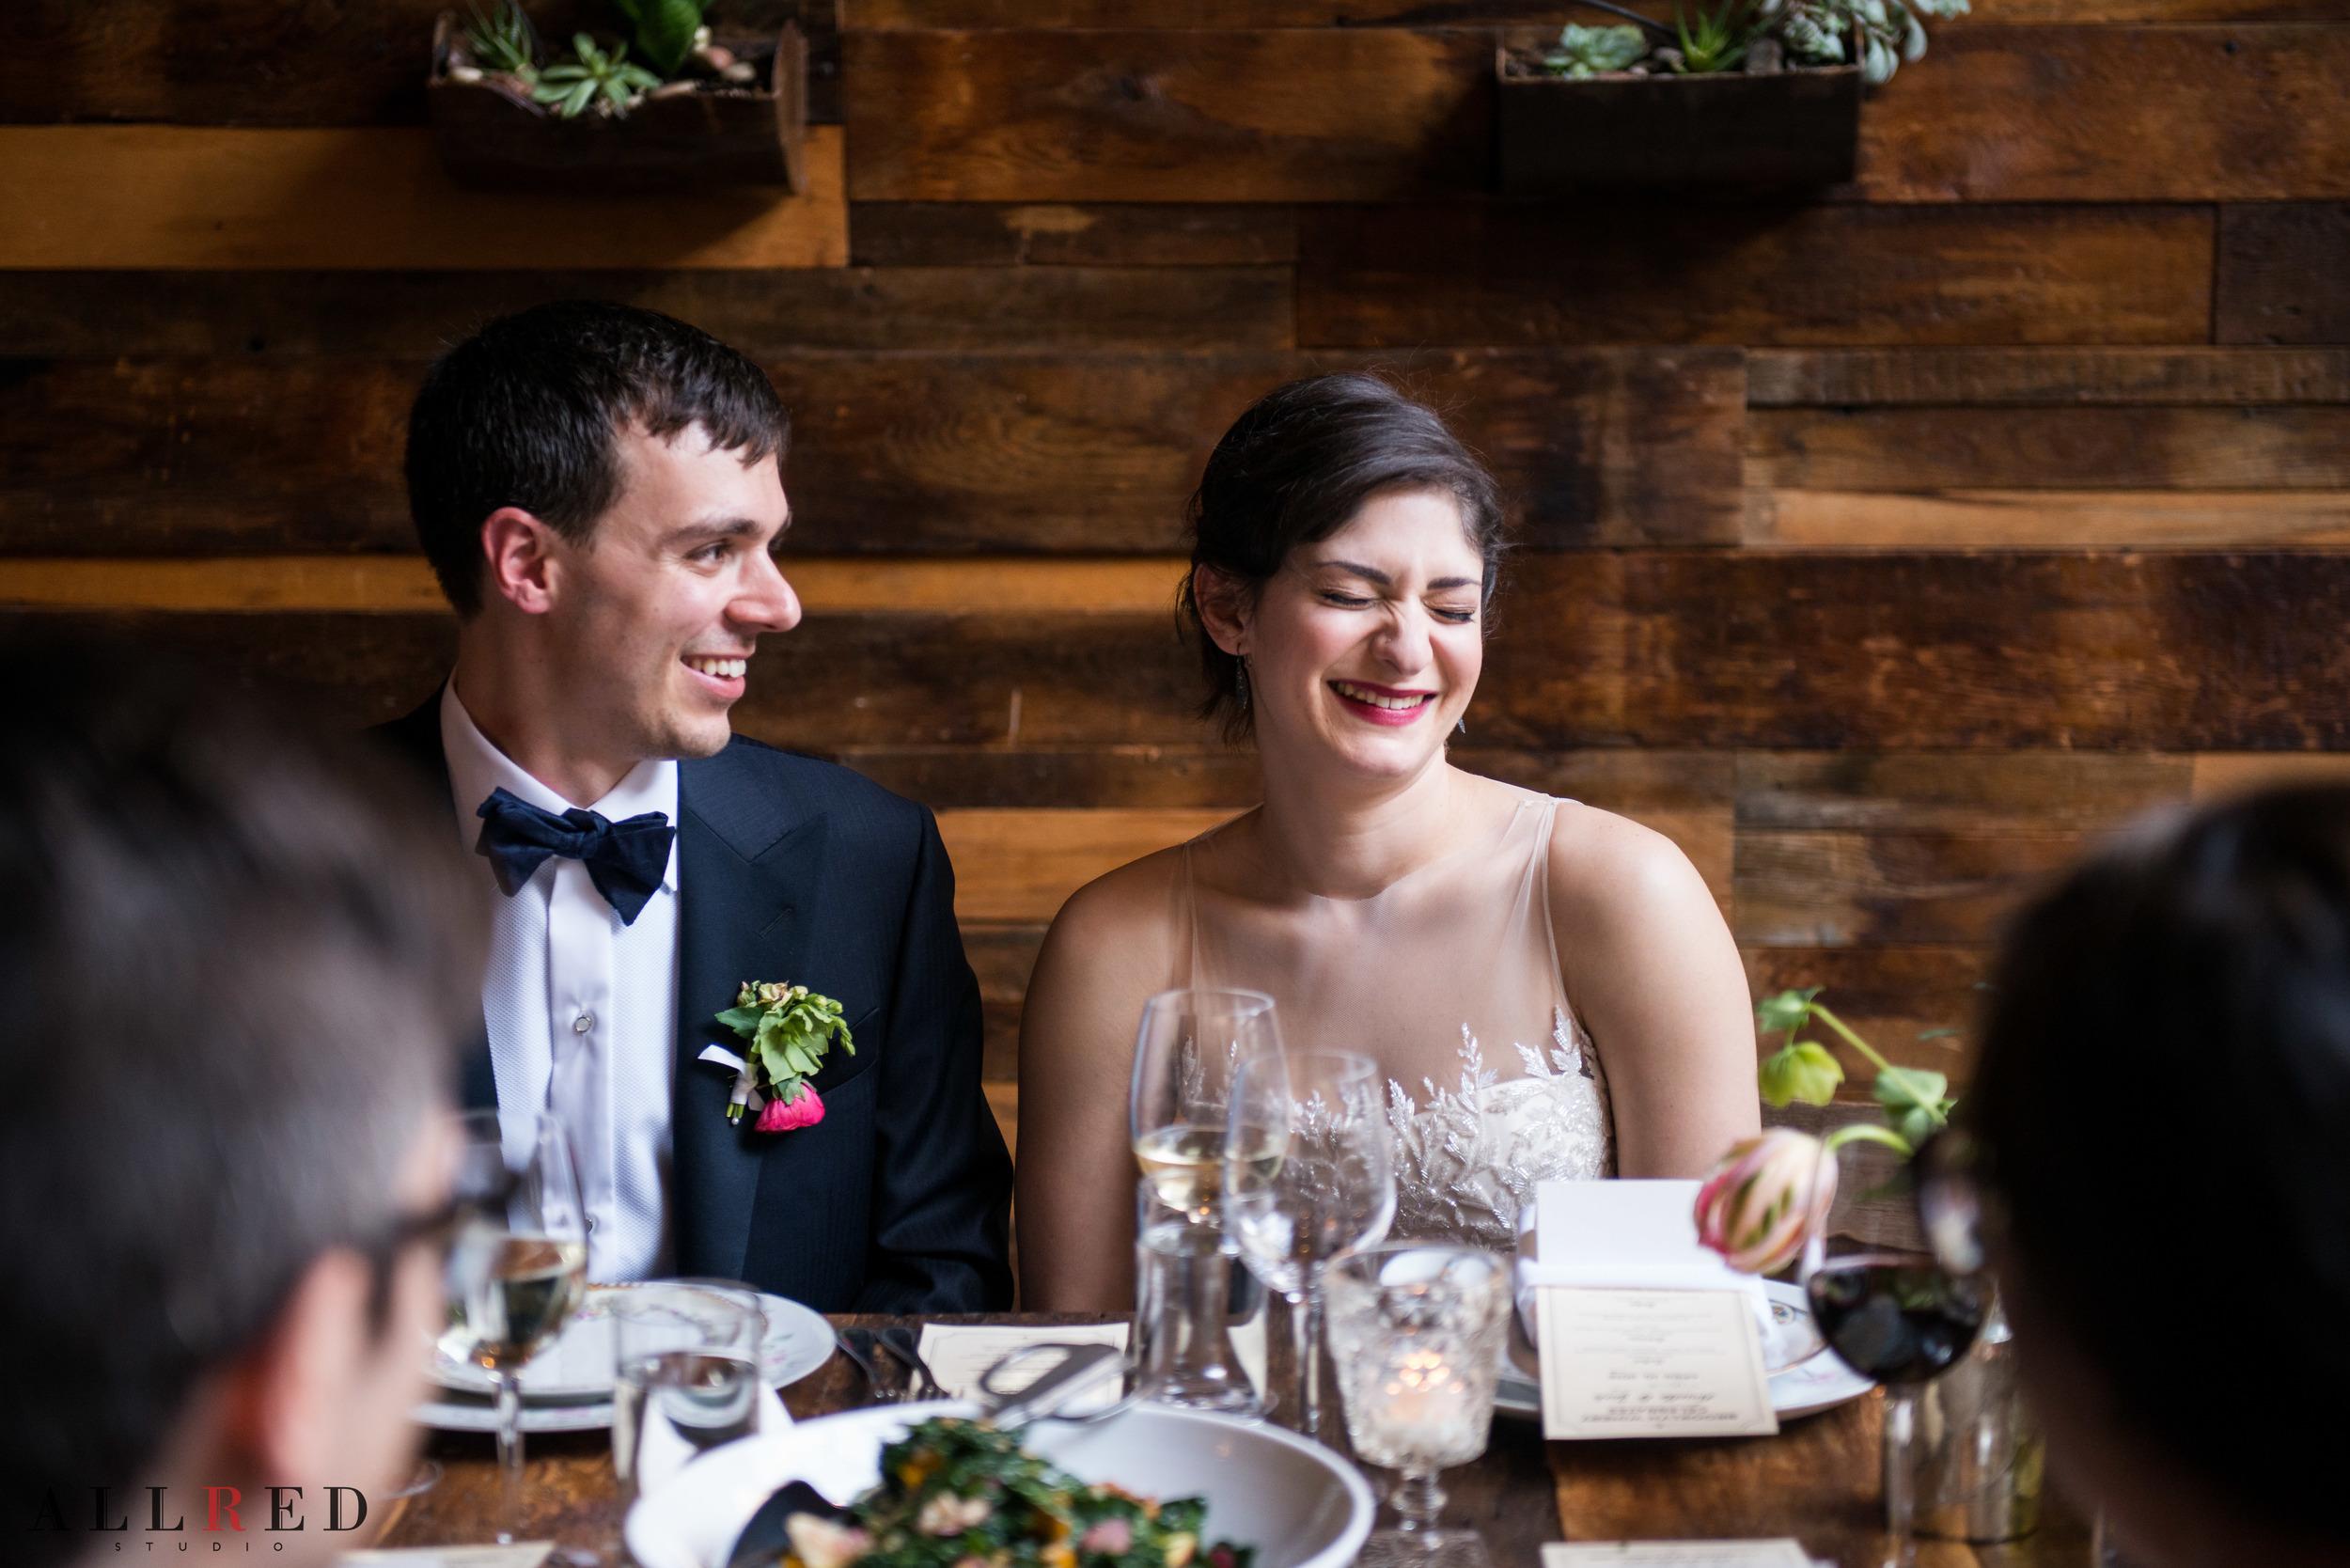 Wedding-Brooklyn-winery-allred-studio-new-york-photographer-new-jersey-hudson-valley-0611.jpg